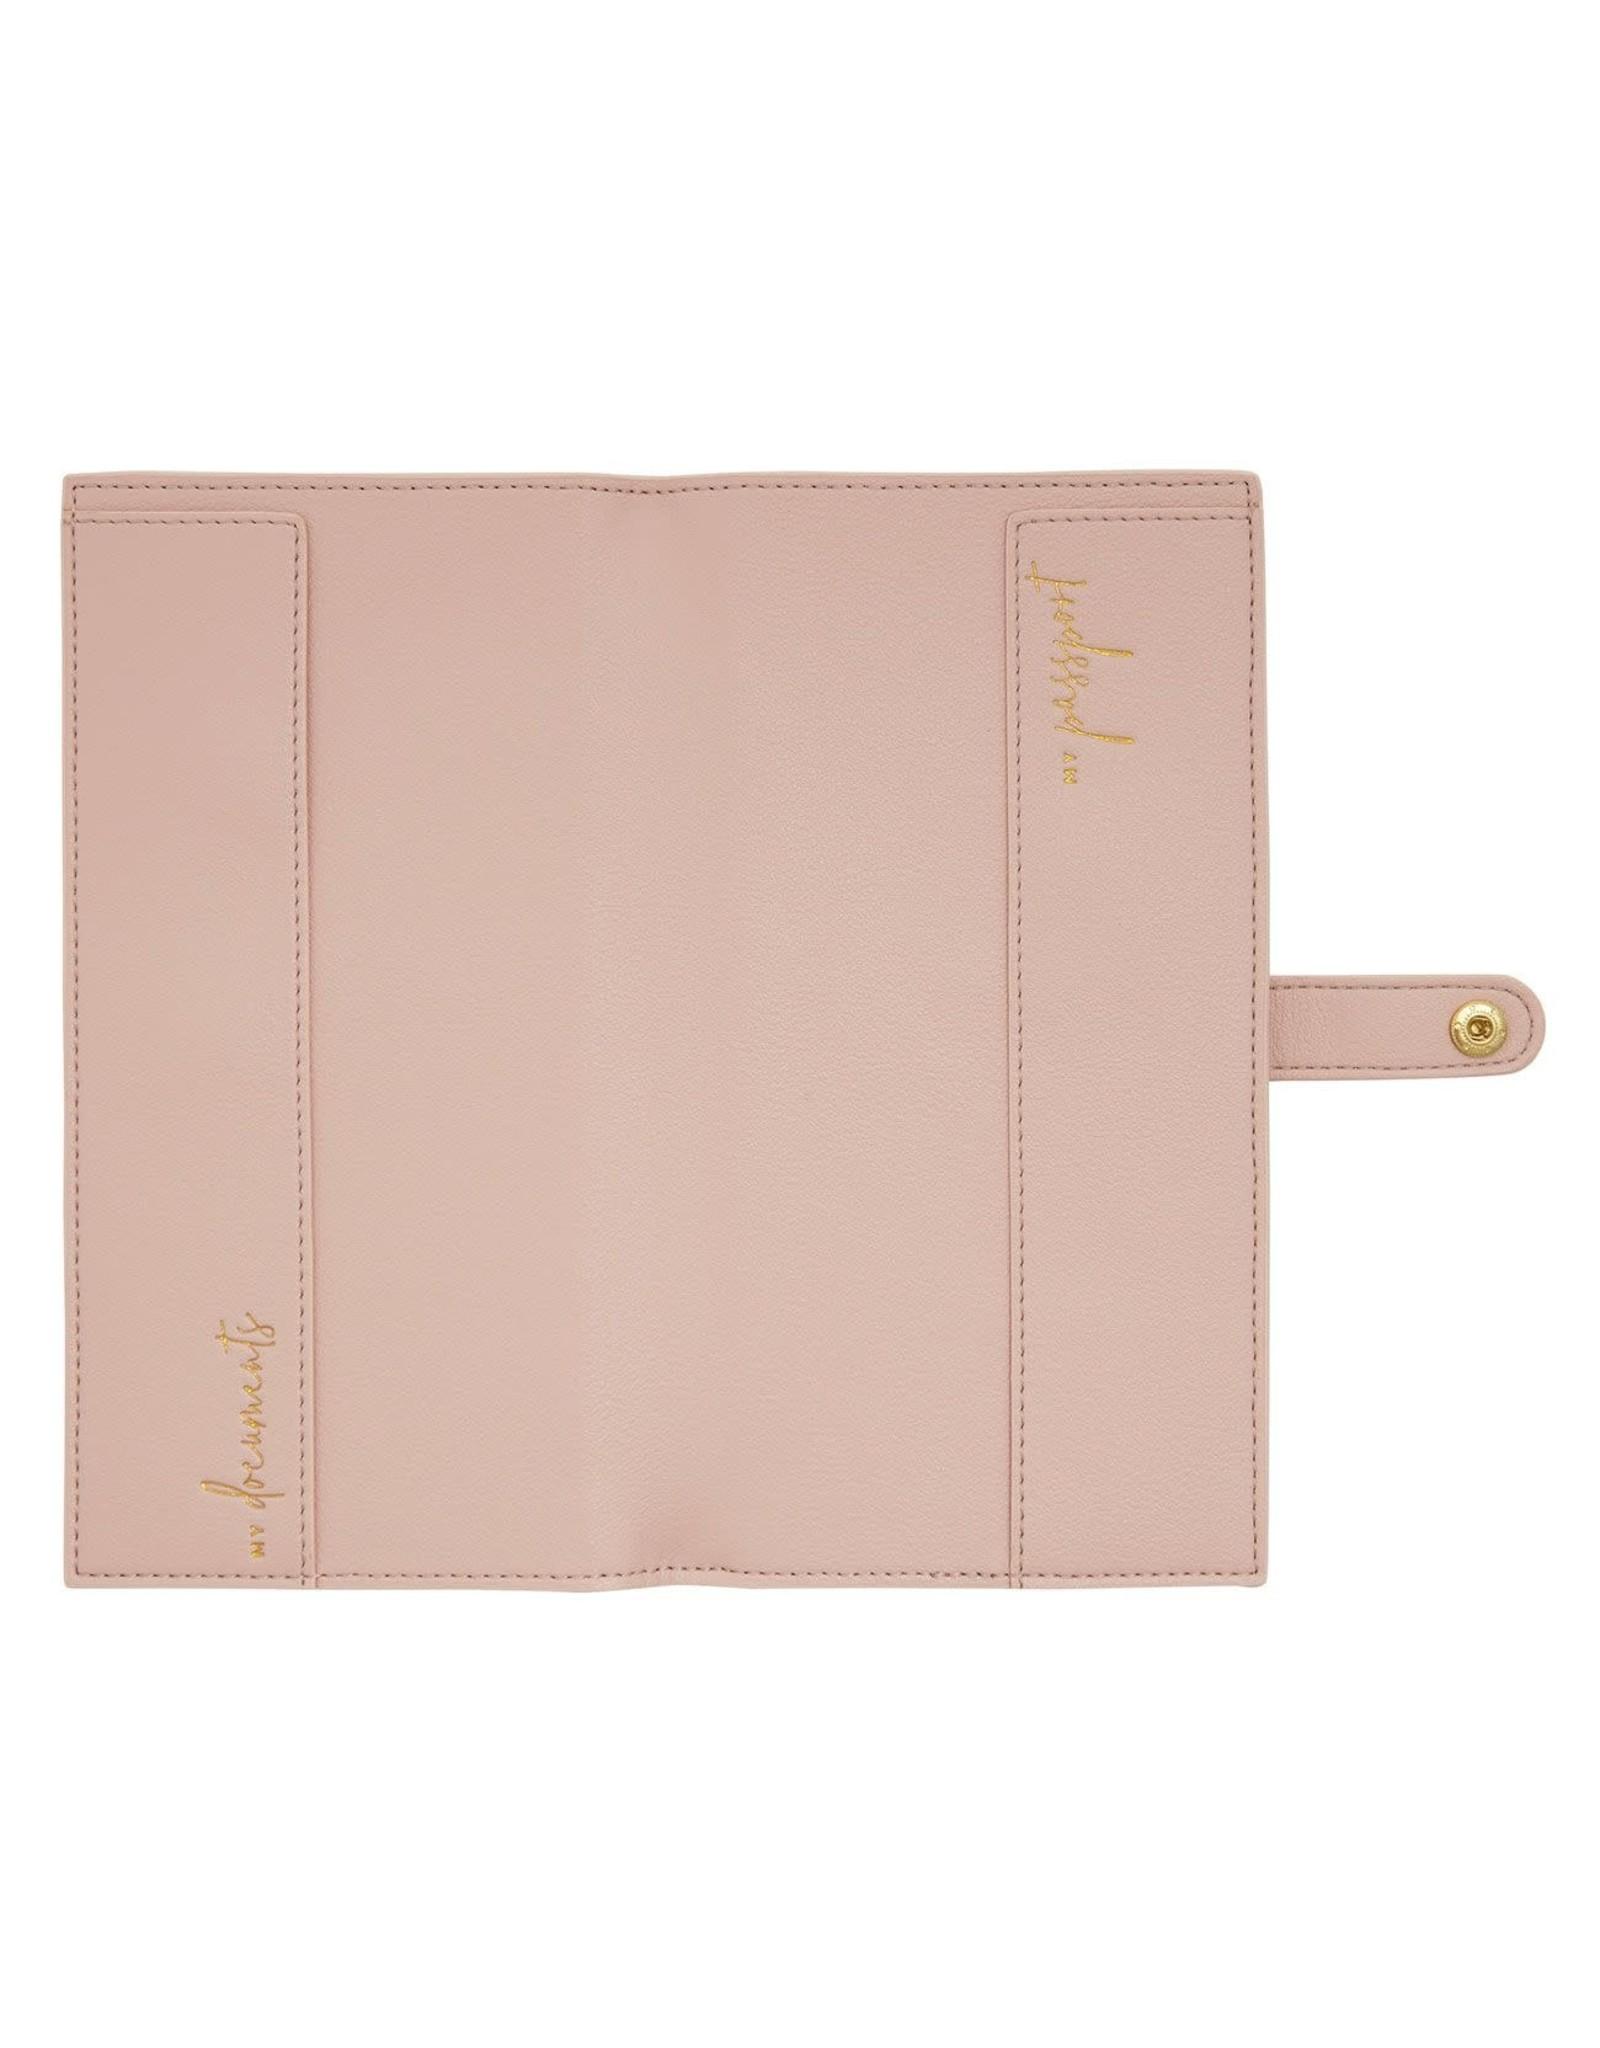 Katie Loxton Travelset - Live Love Sparkle - Pink